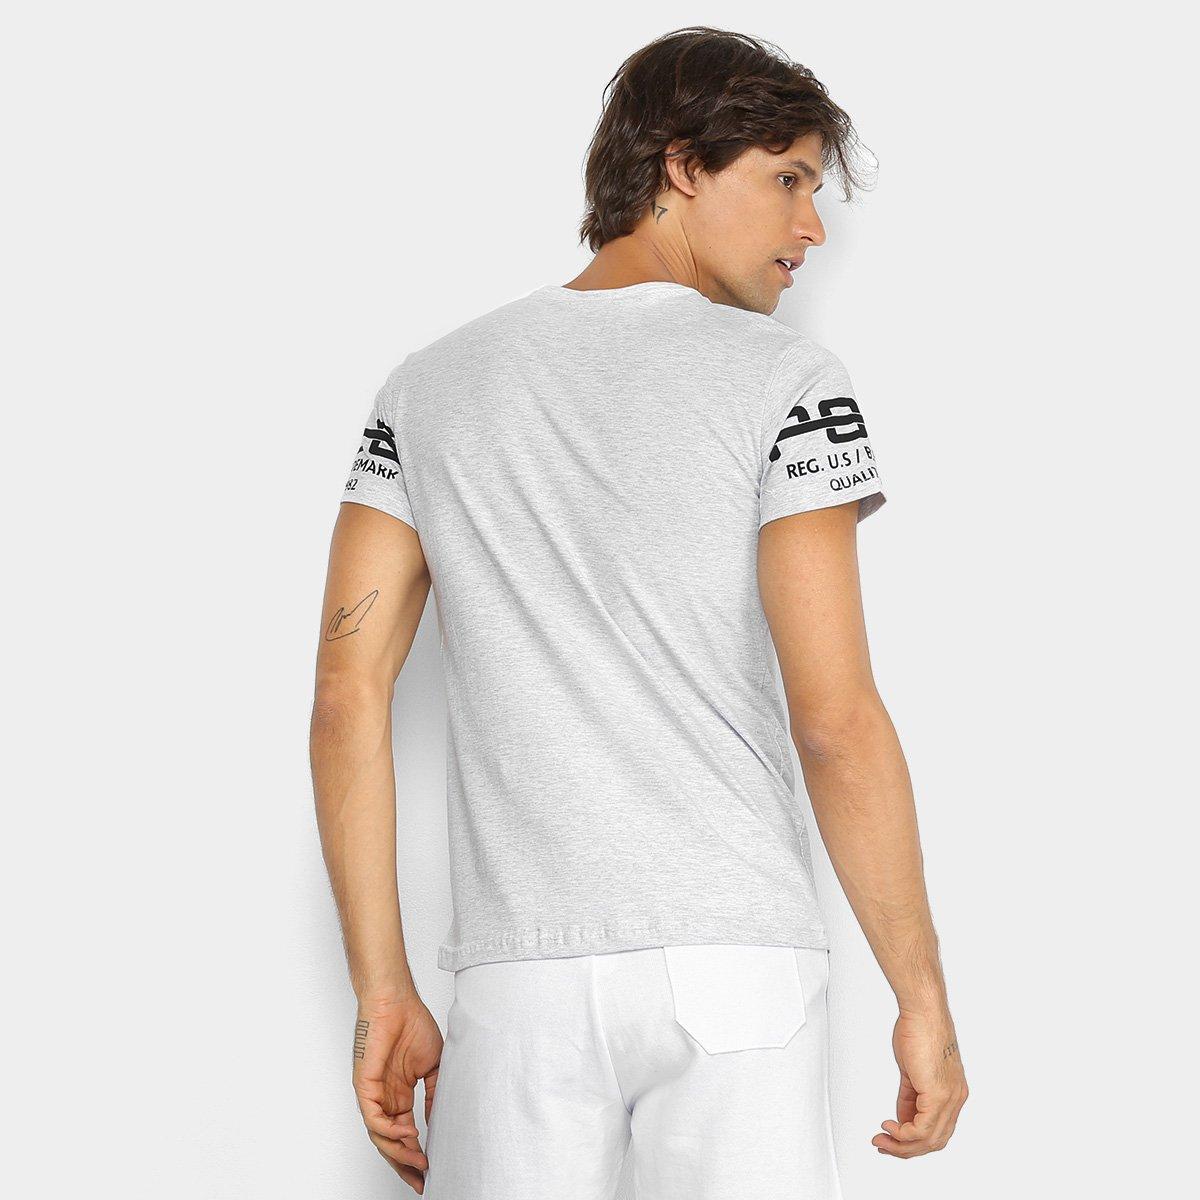 Foto 2 - Camiseta RG 518 Meia Malha Estampada Masculina